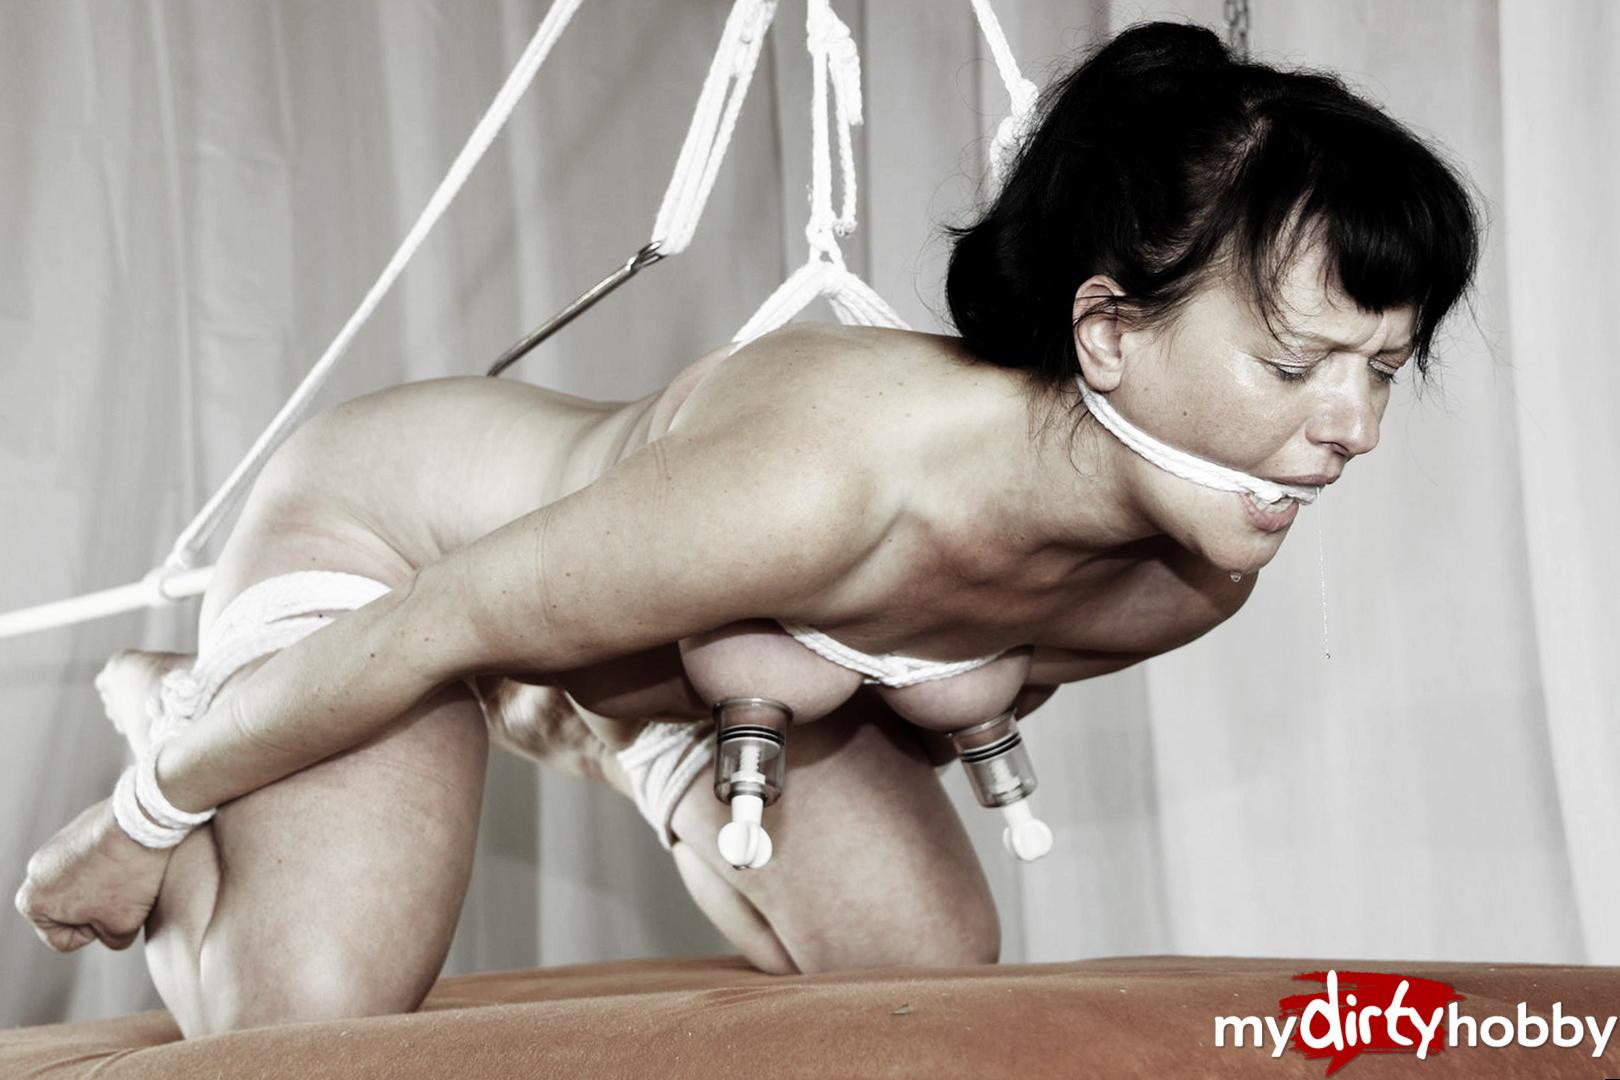 MyDirtyHobby.com/YvetteXtreme - Deutsch MDH SITERIP